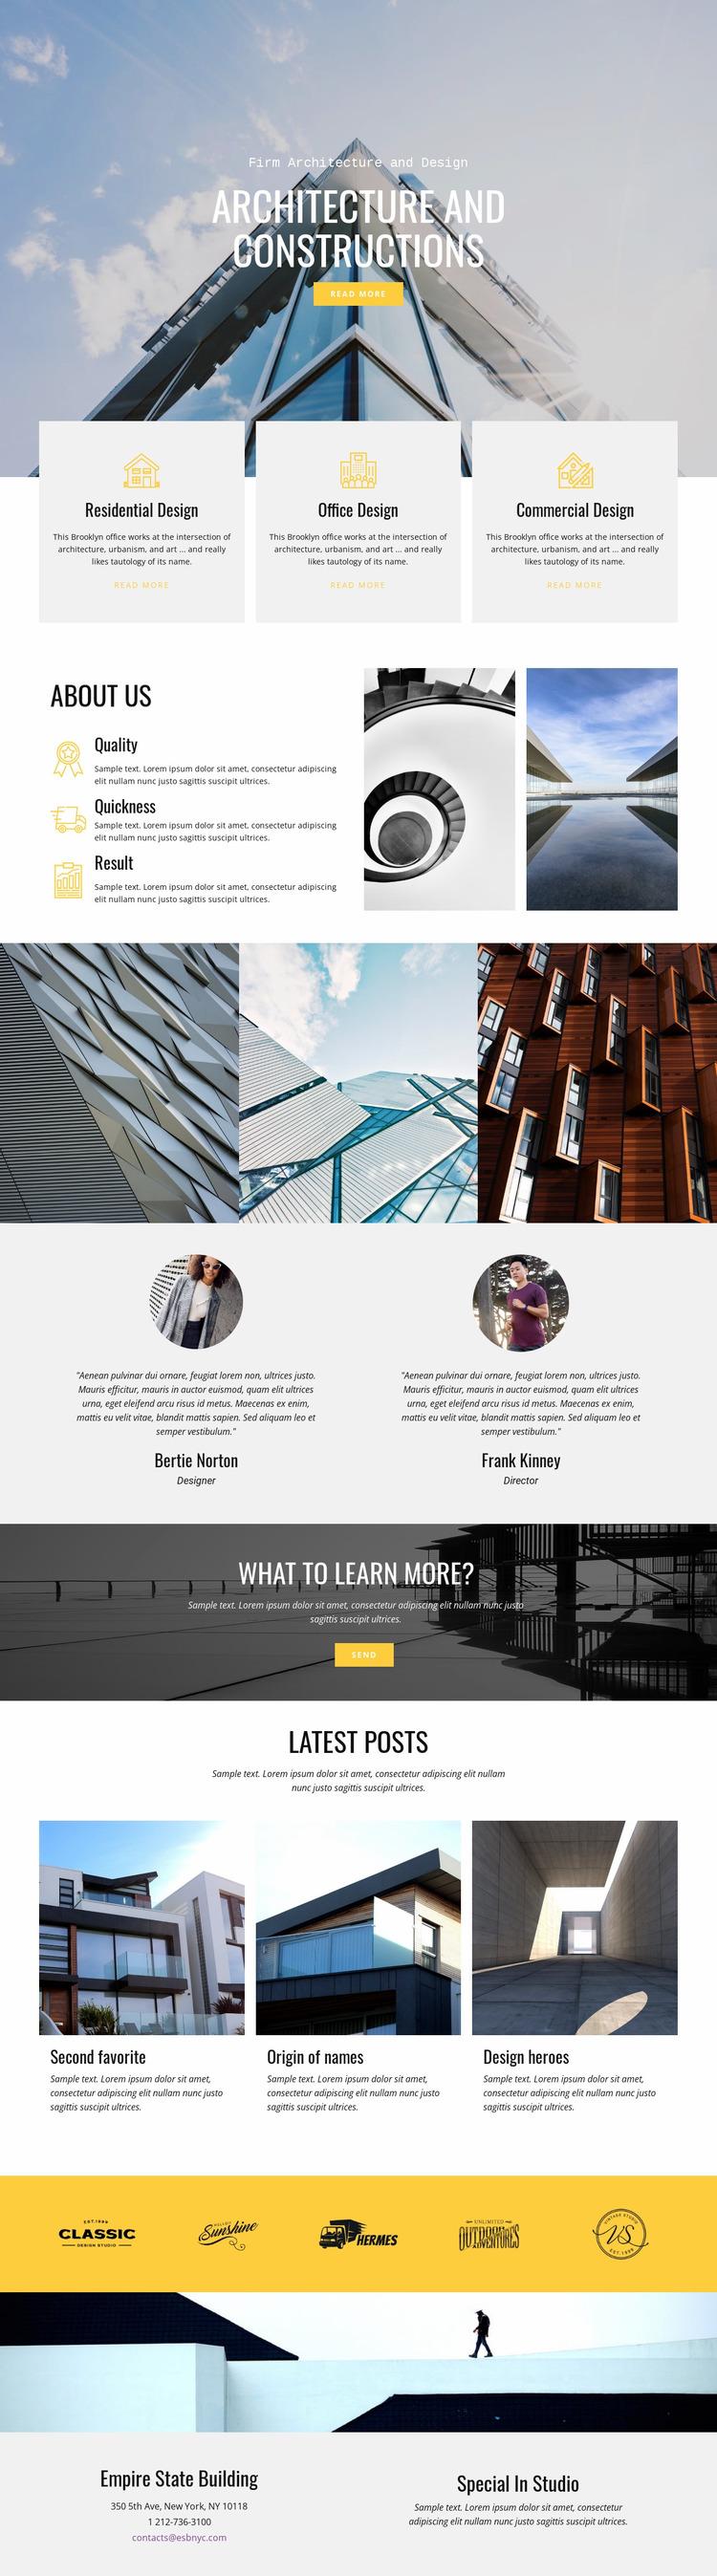 Constructive architecture Website Mockup